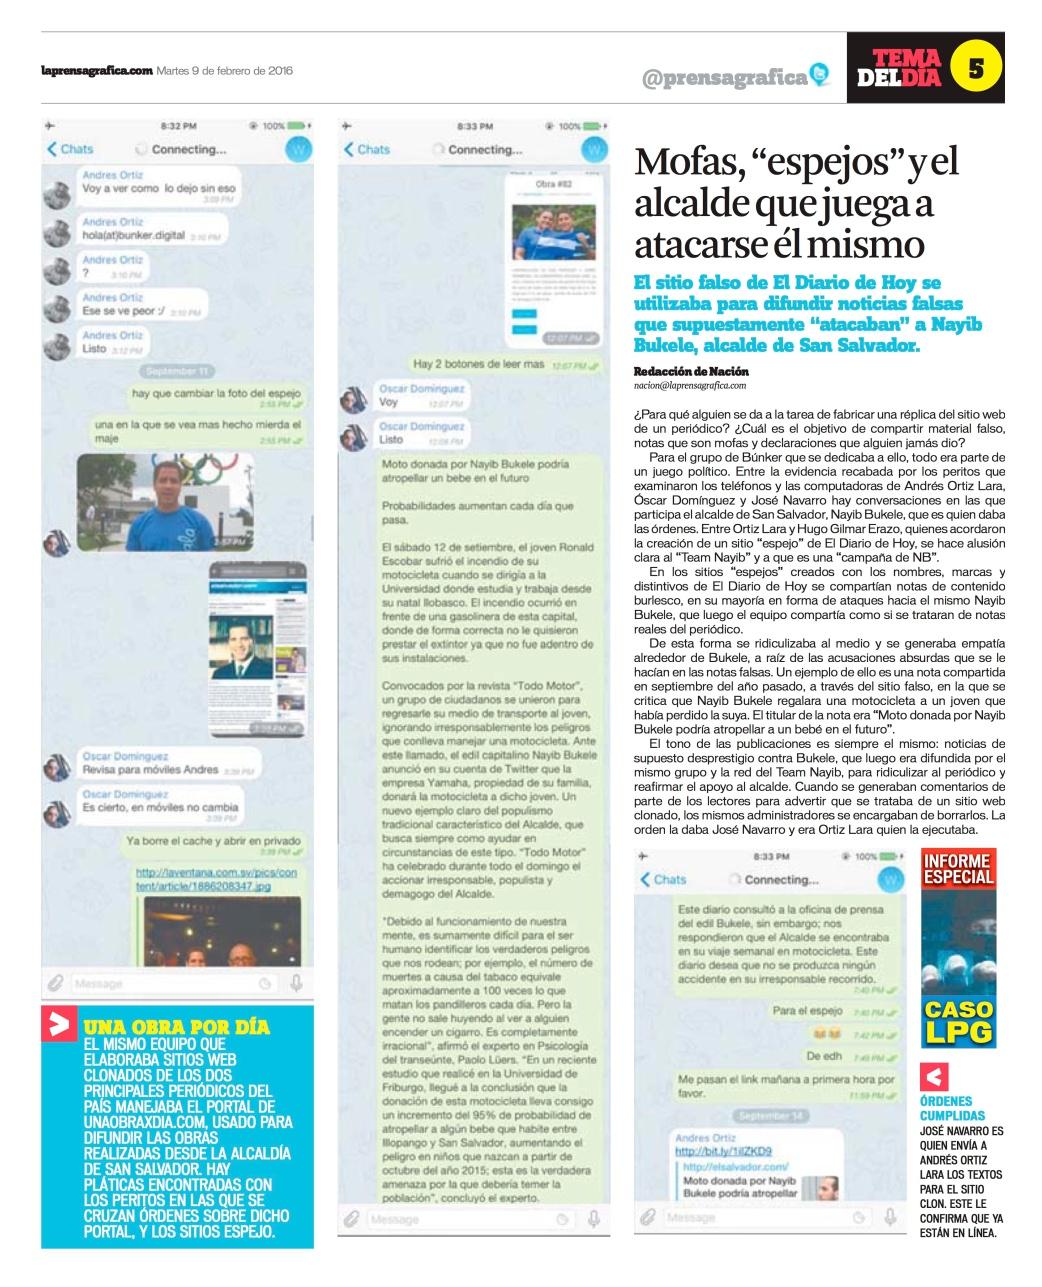 LPG20160209 - La Prensa Gráfica - PORTADA - pag 5